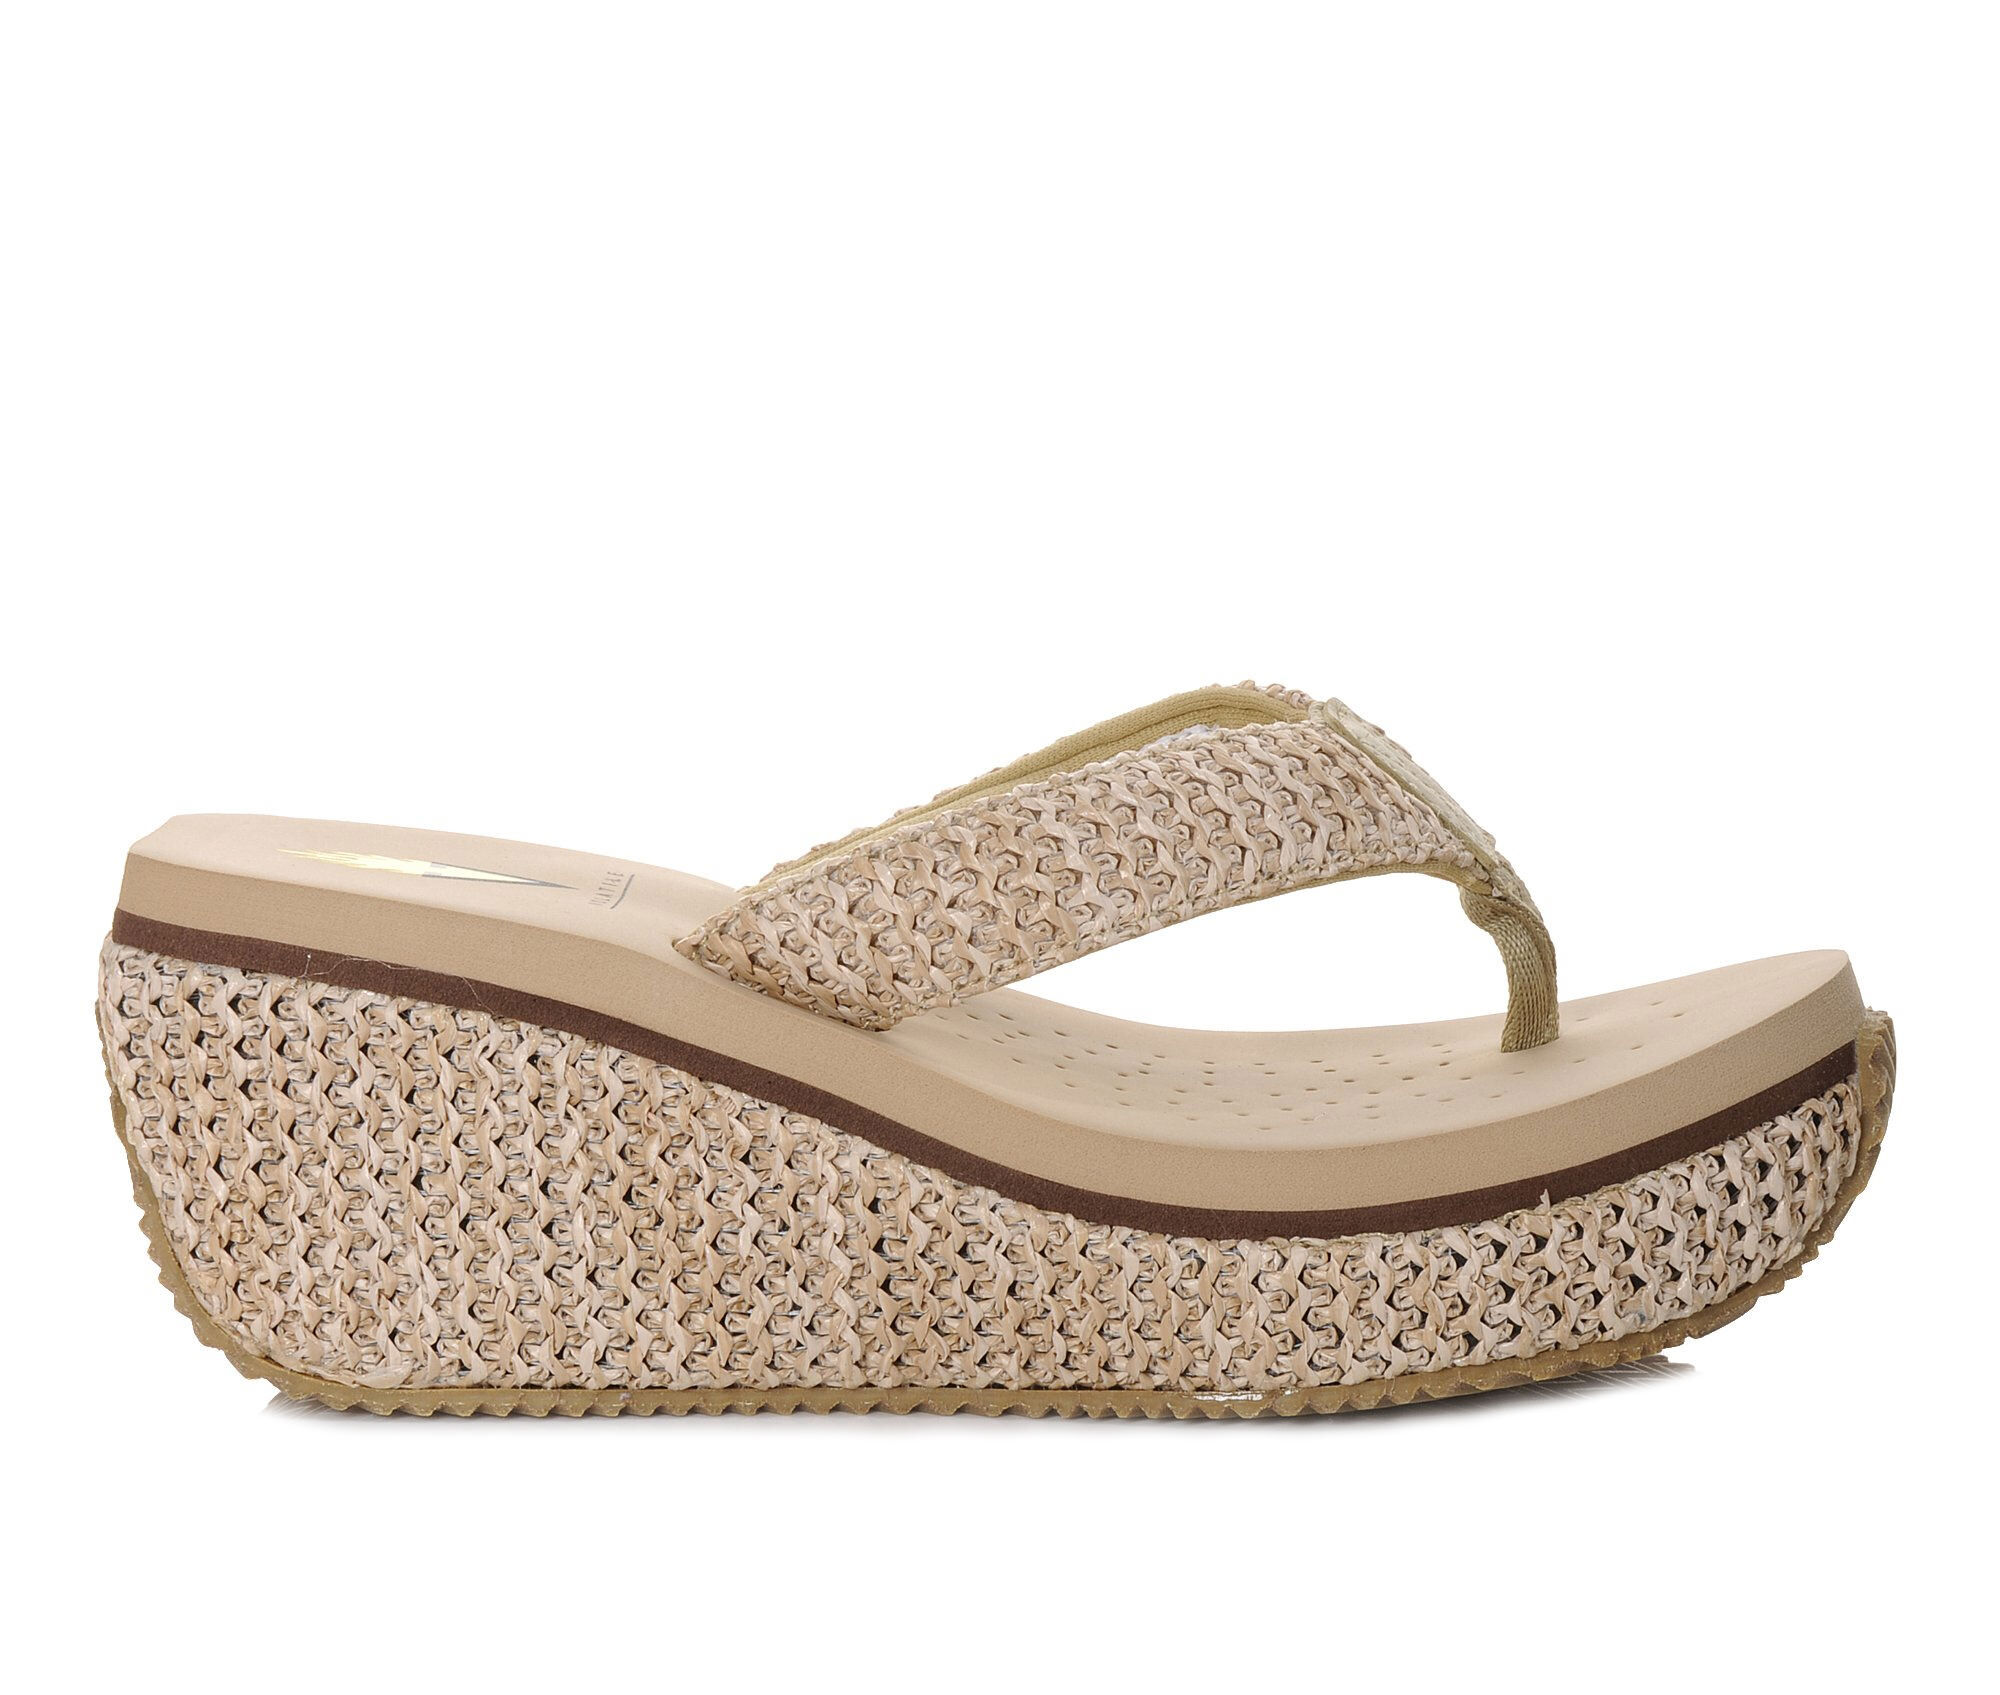 uk shoes_kd3612